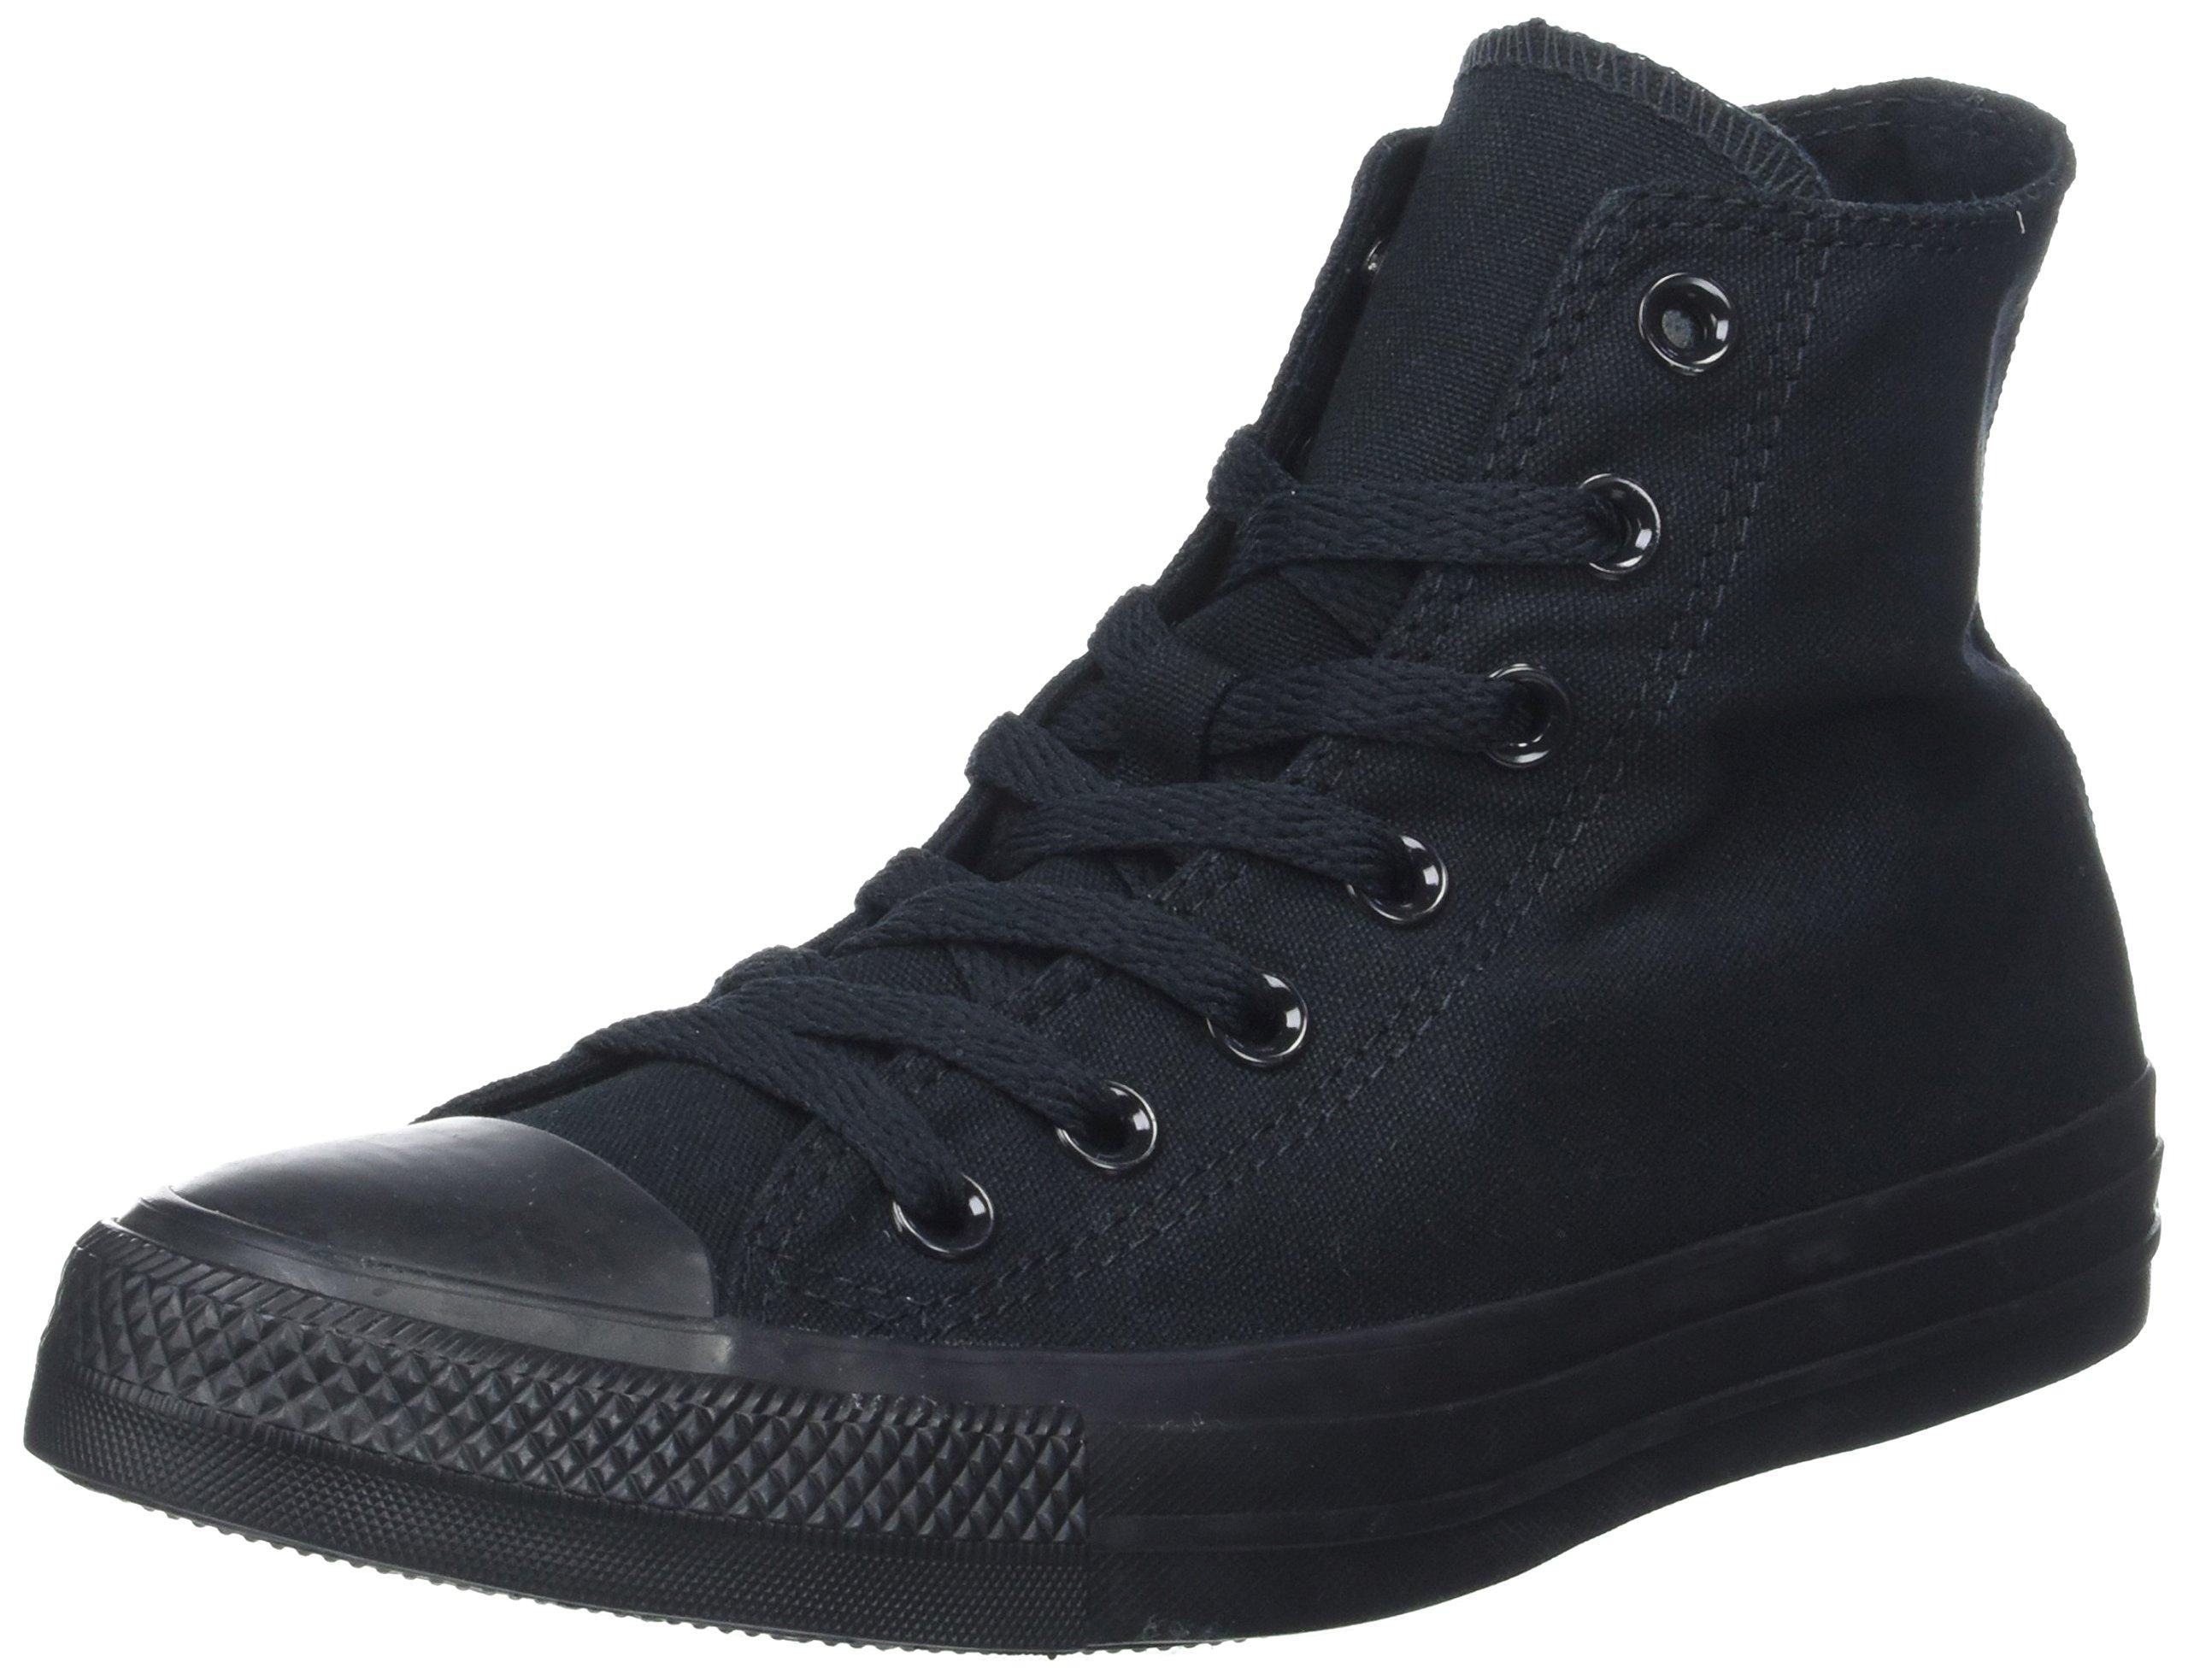 Converse Chuck Taylor All Star Canvas High Top Sneaker, Black, 8 US Men/10 US Women by Converse